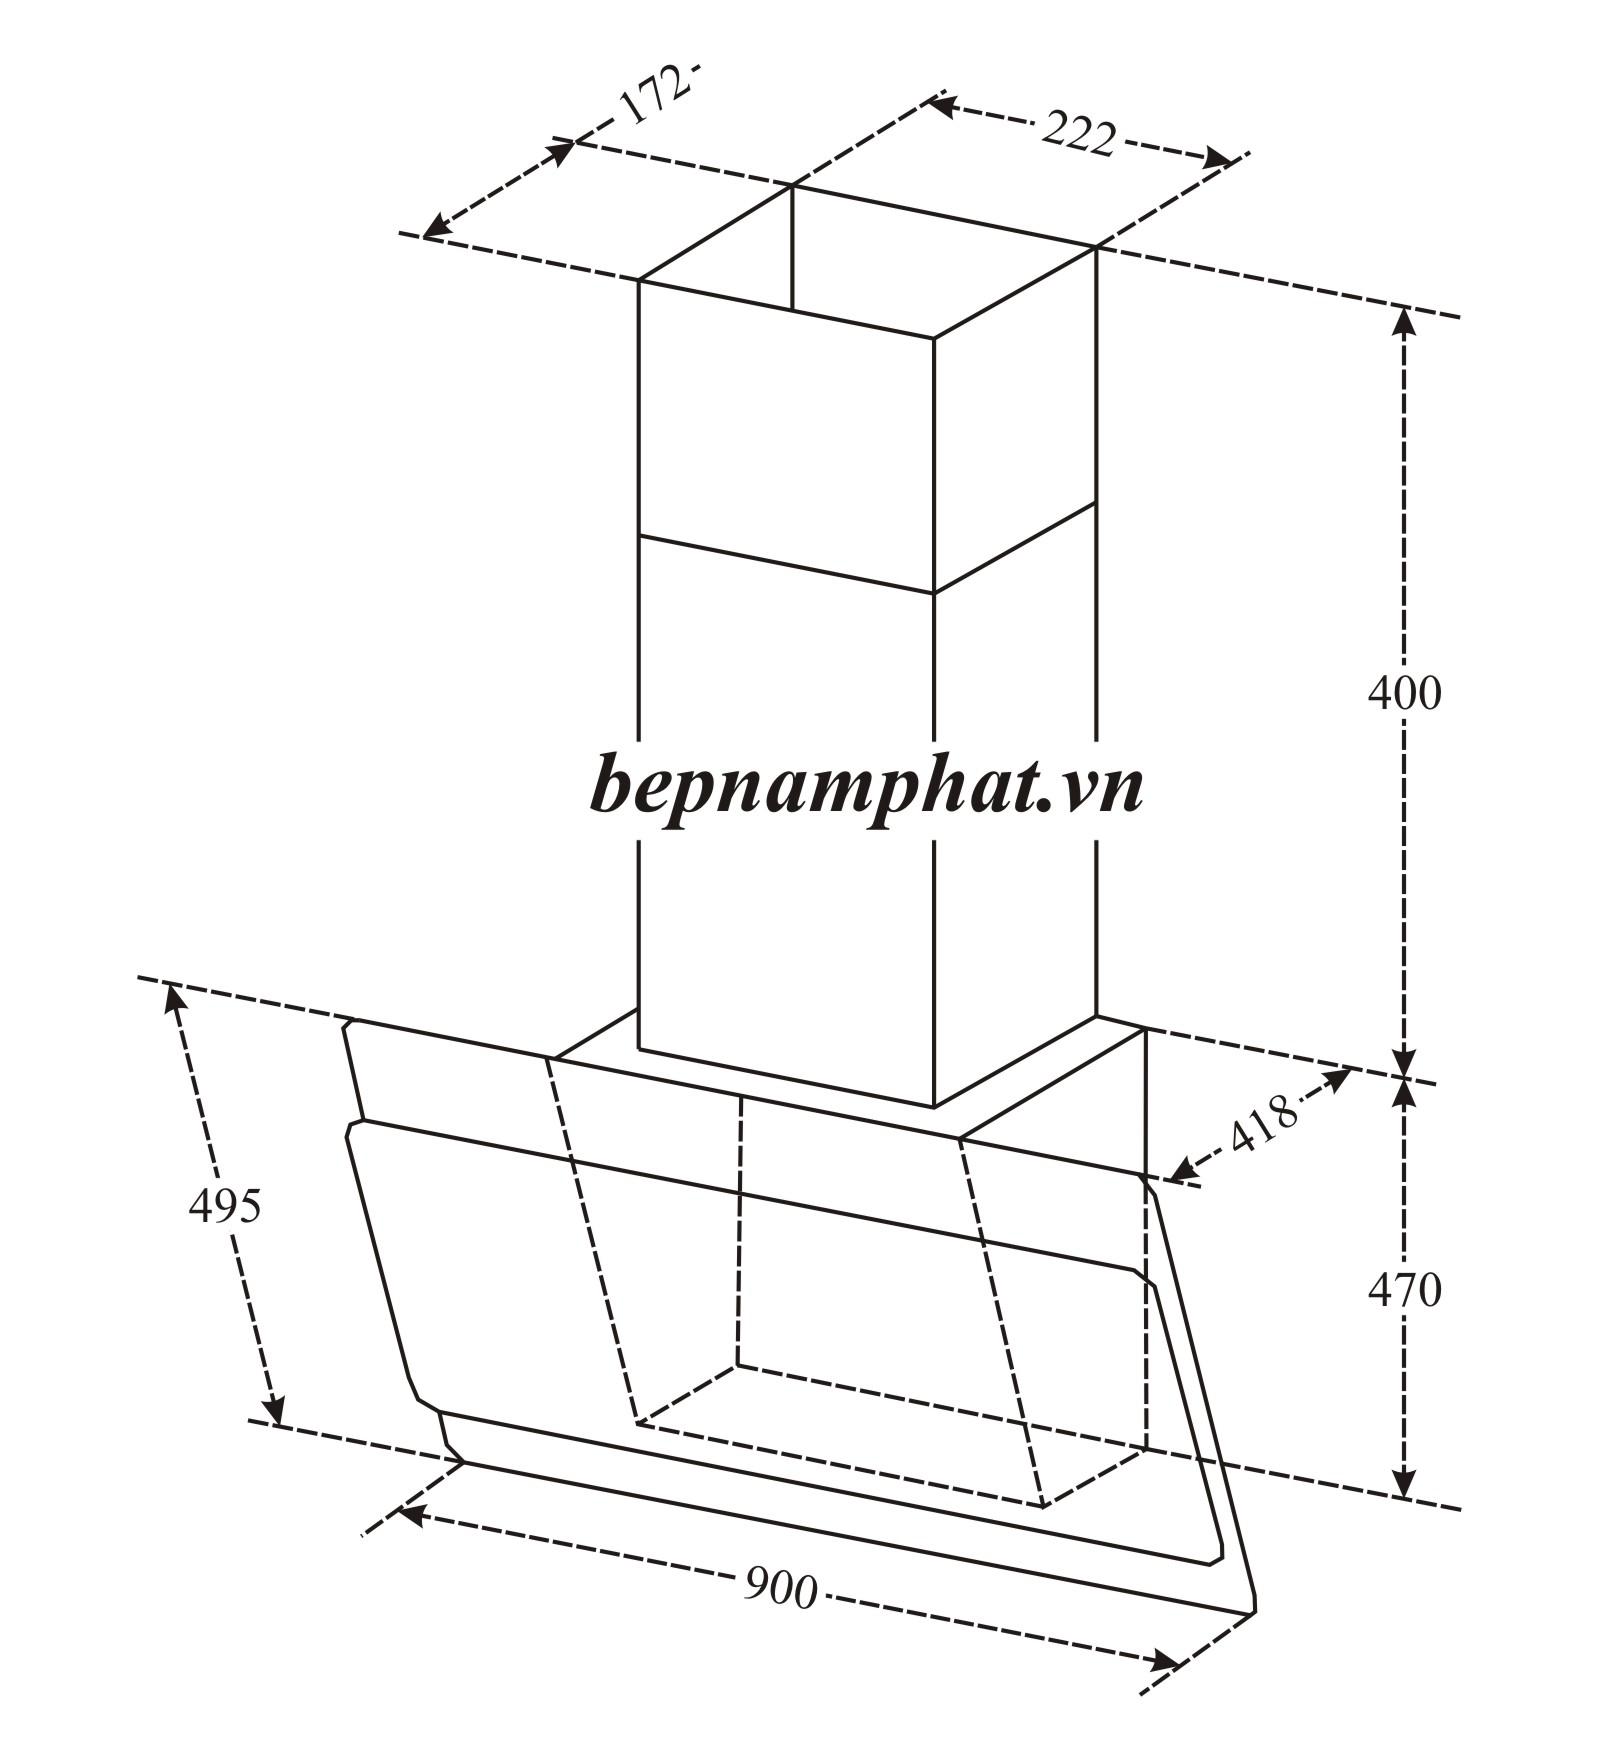 Máy Hút Mùi Binova BI-75-GT-09 – Bếp Nam Phát